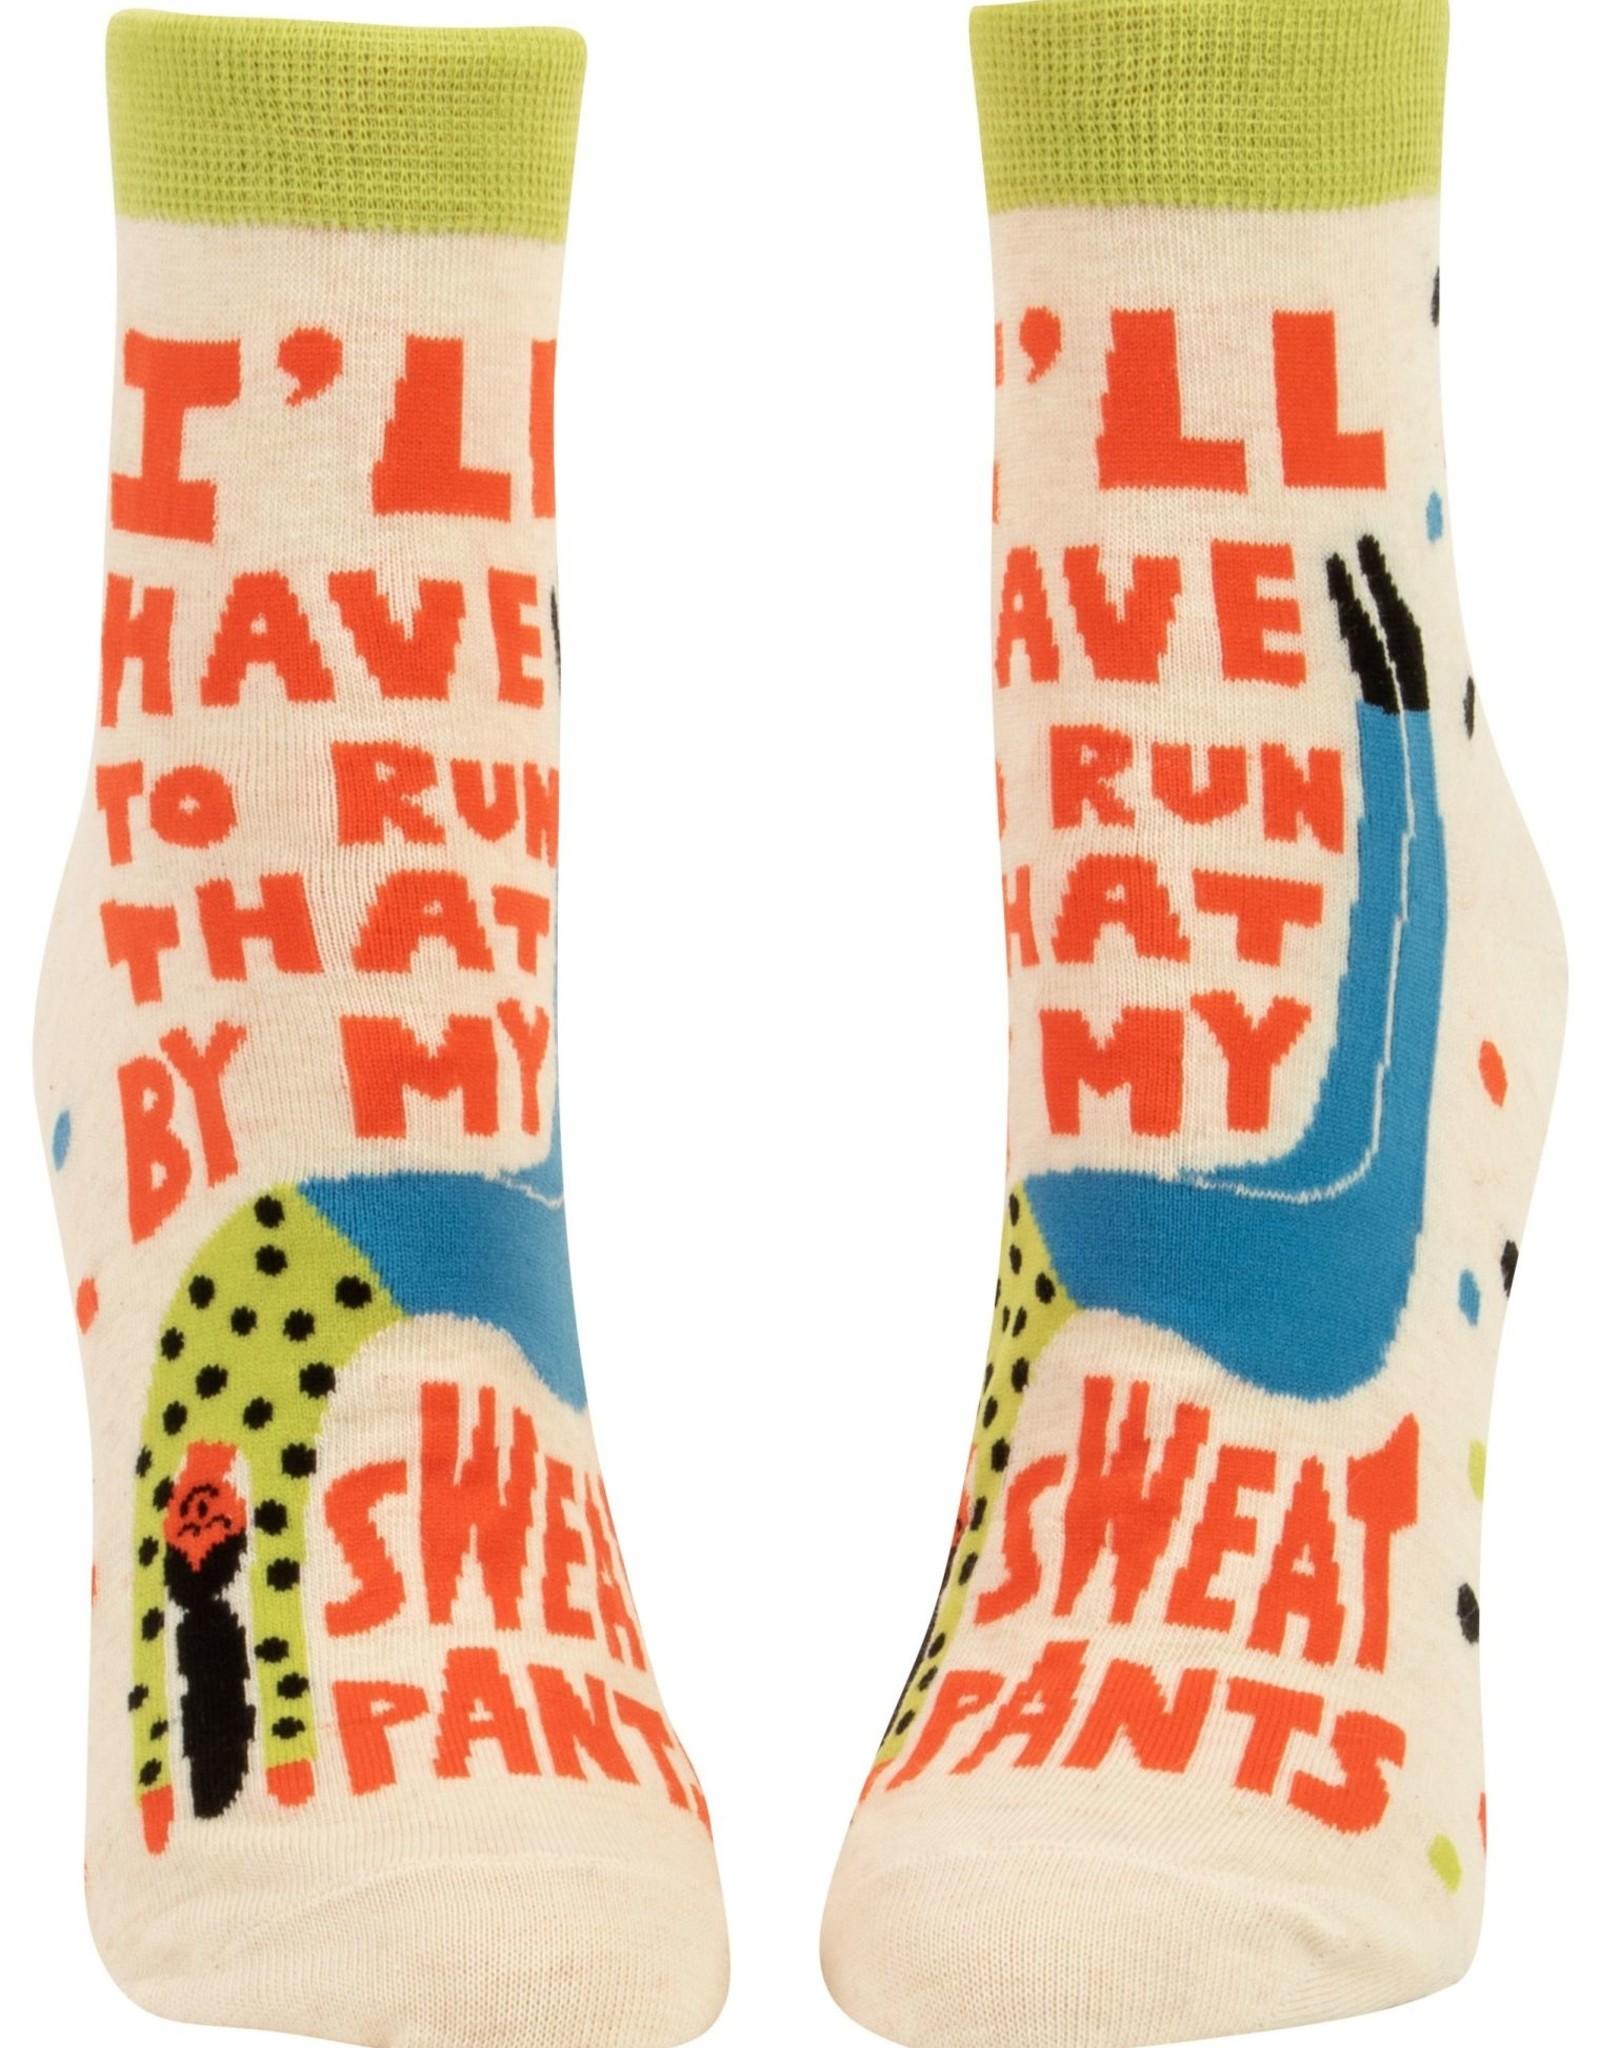 BlueQ My Sweatpants Ankle Socks